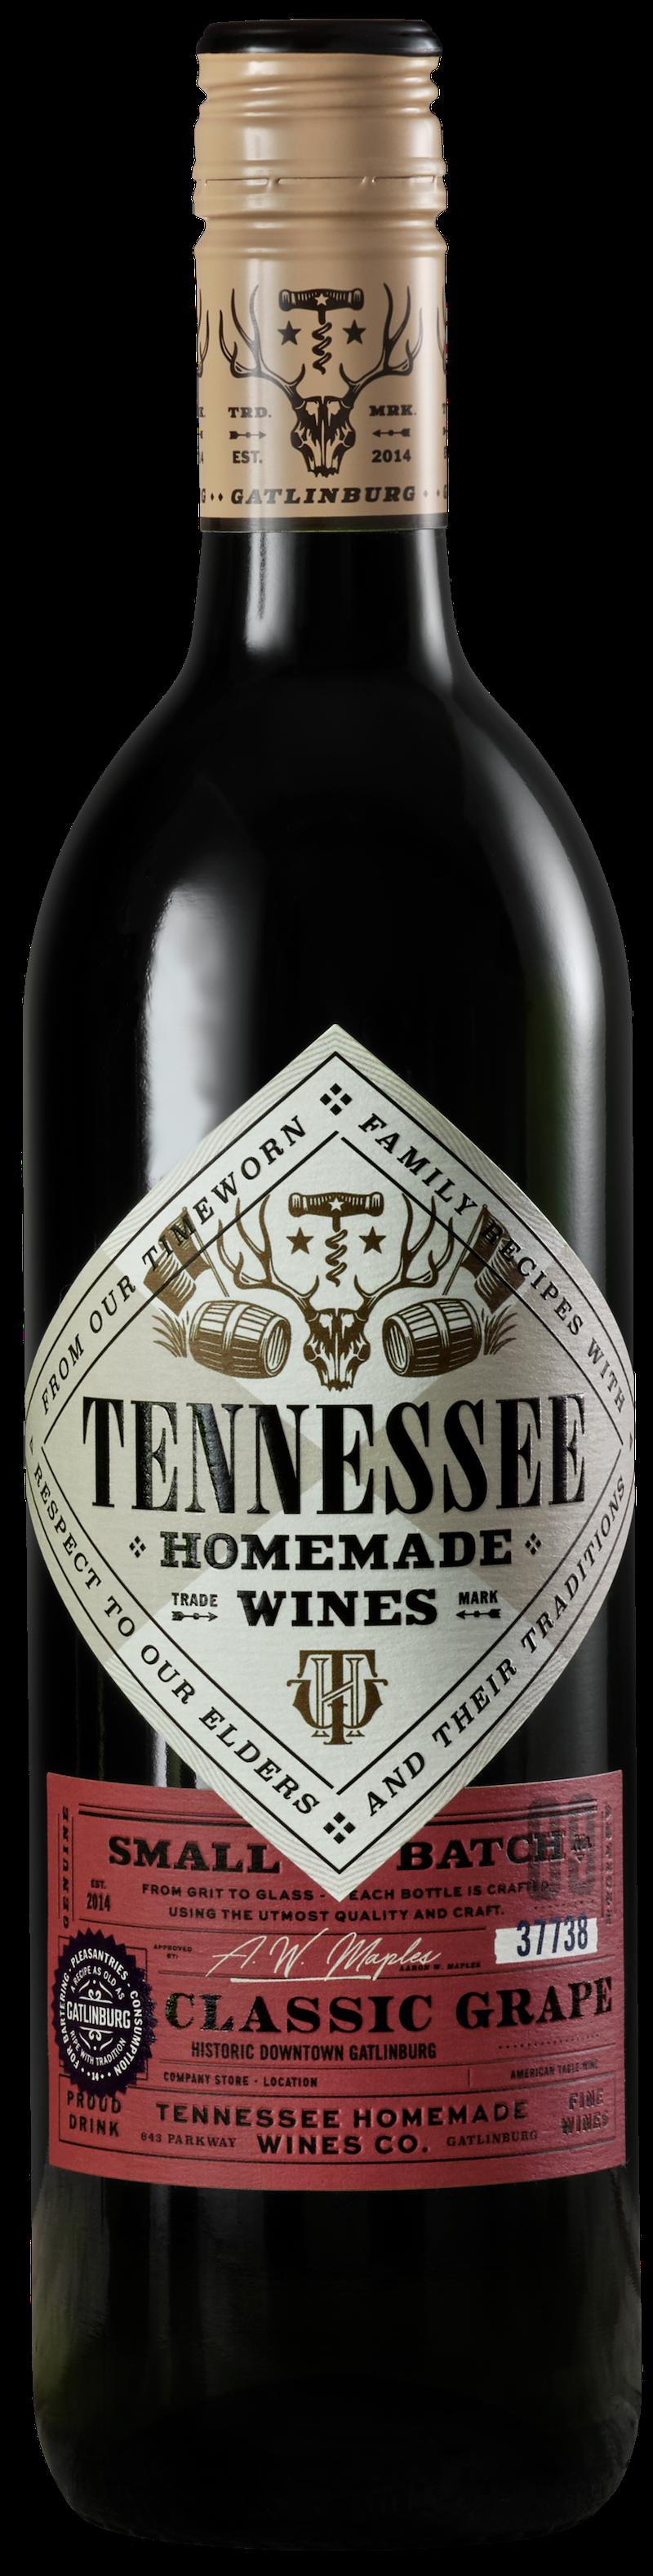 Tennessee Homemade Wines classic grape wine